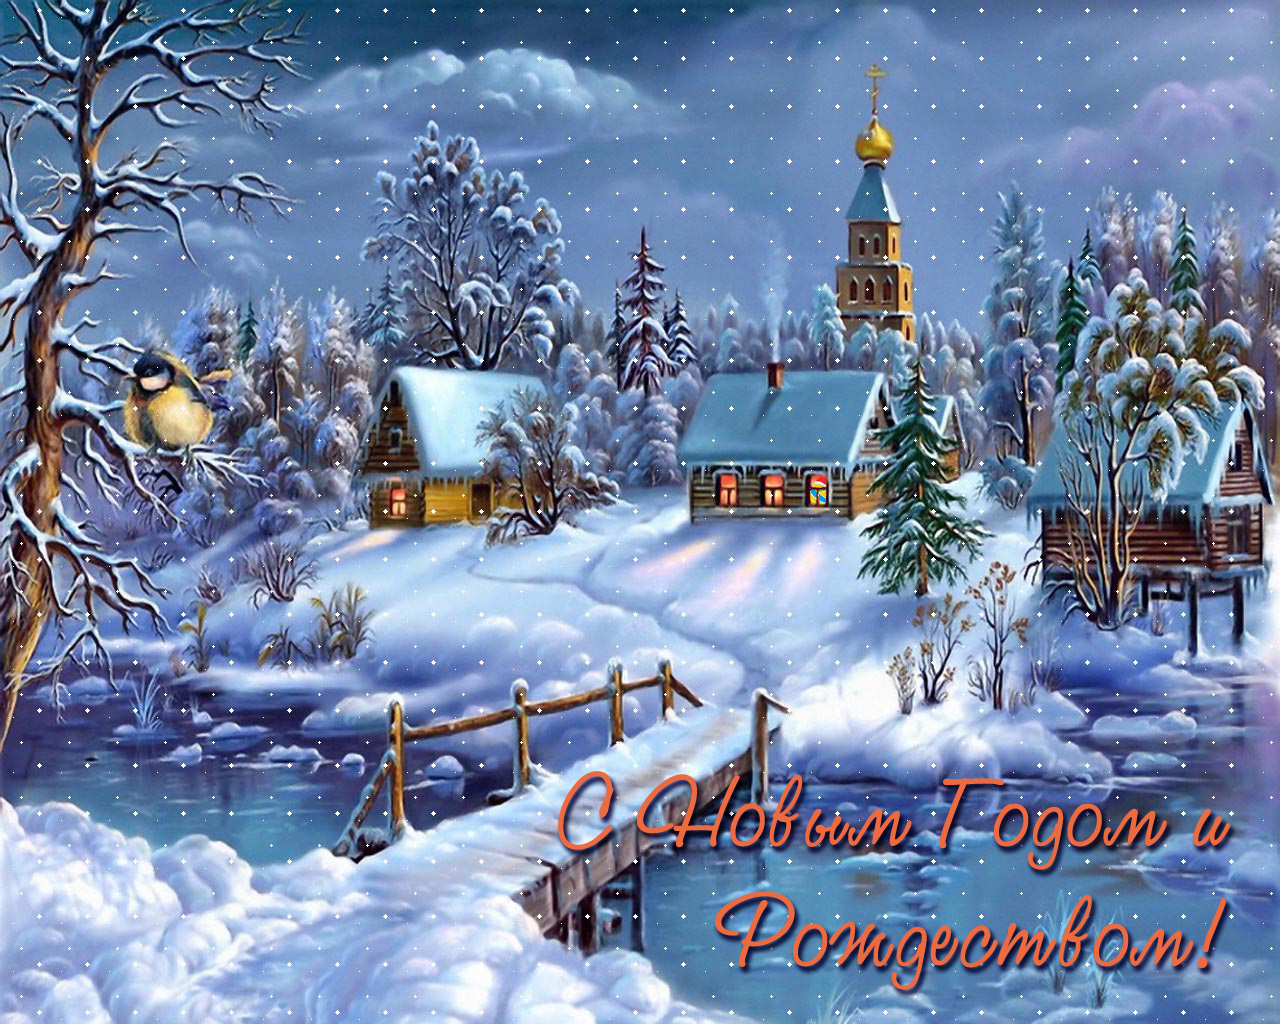 НГ и Рождество 2015